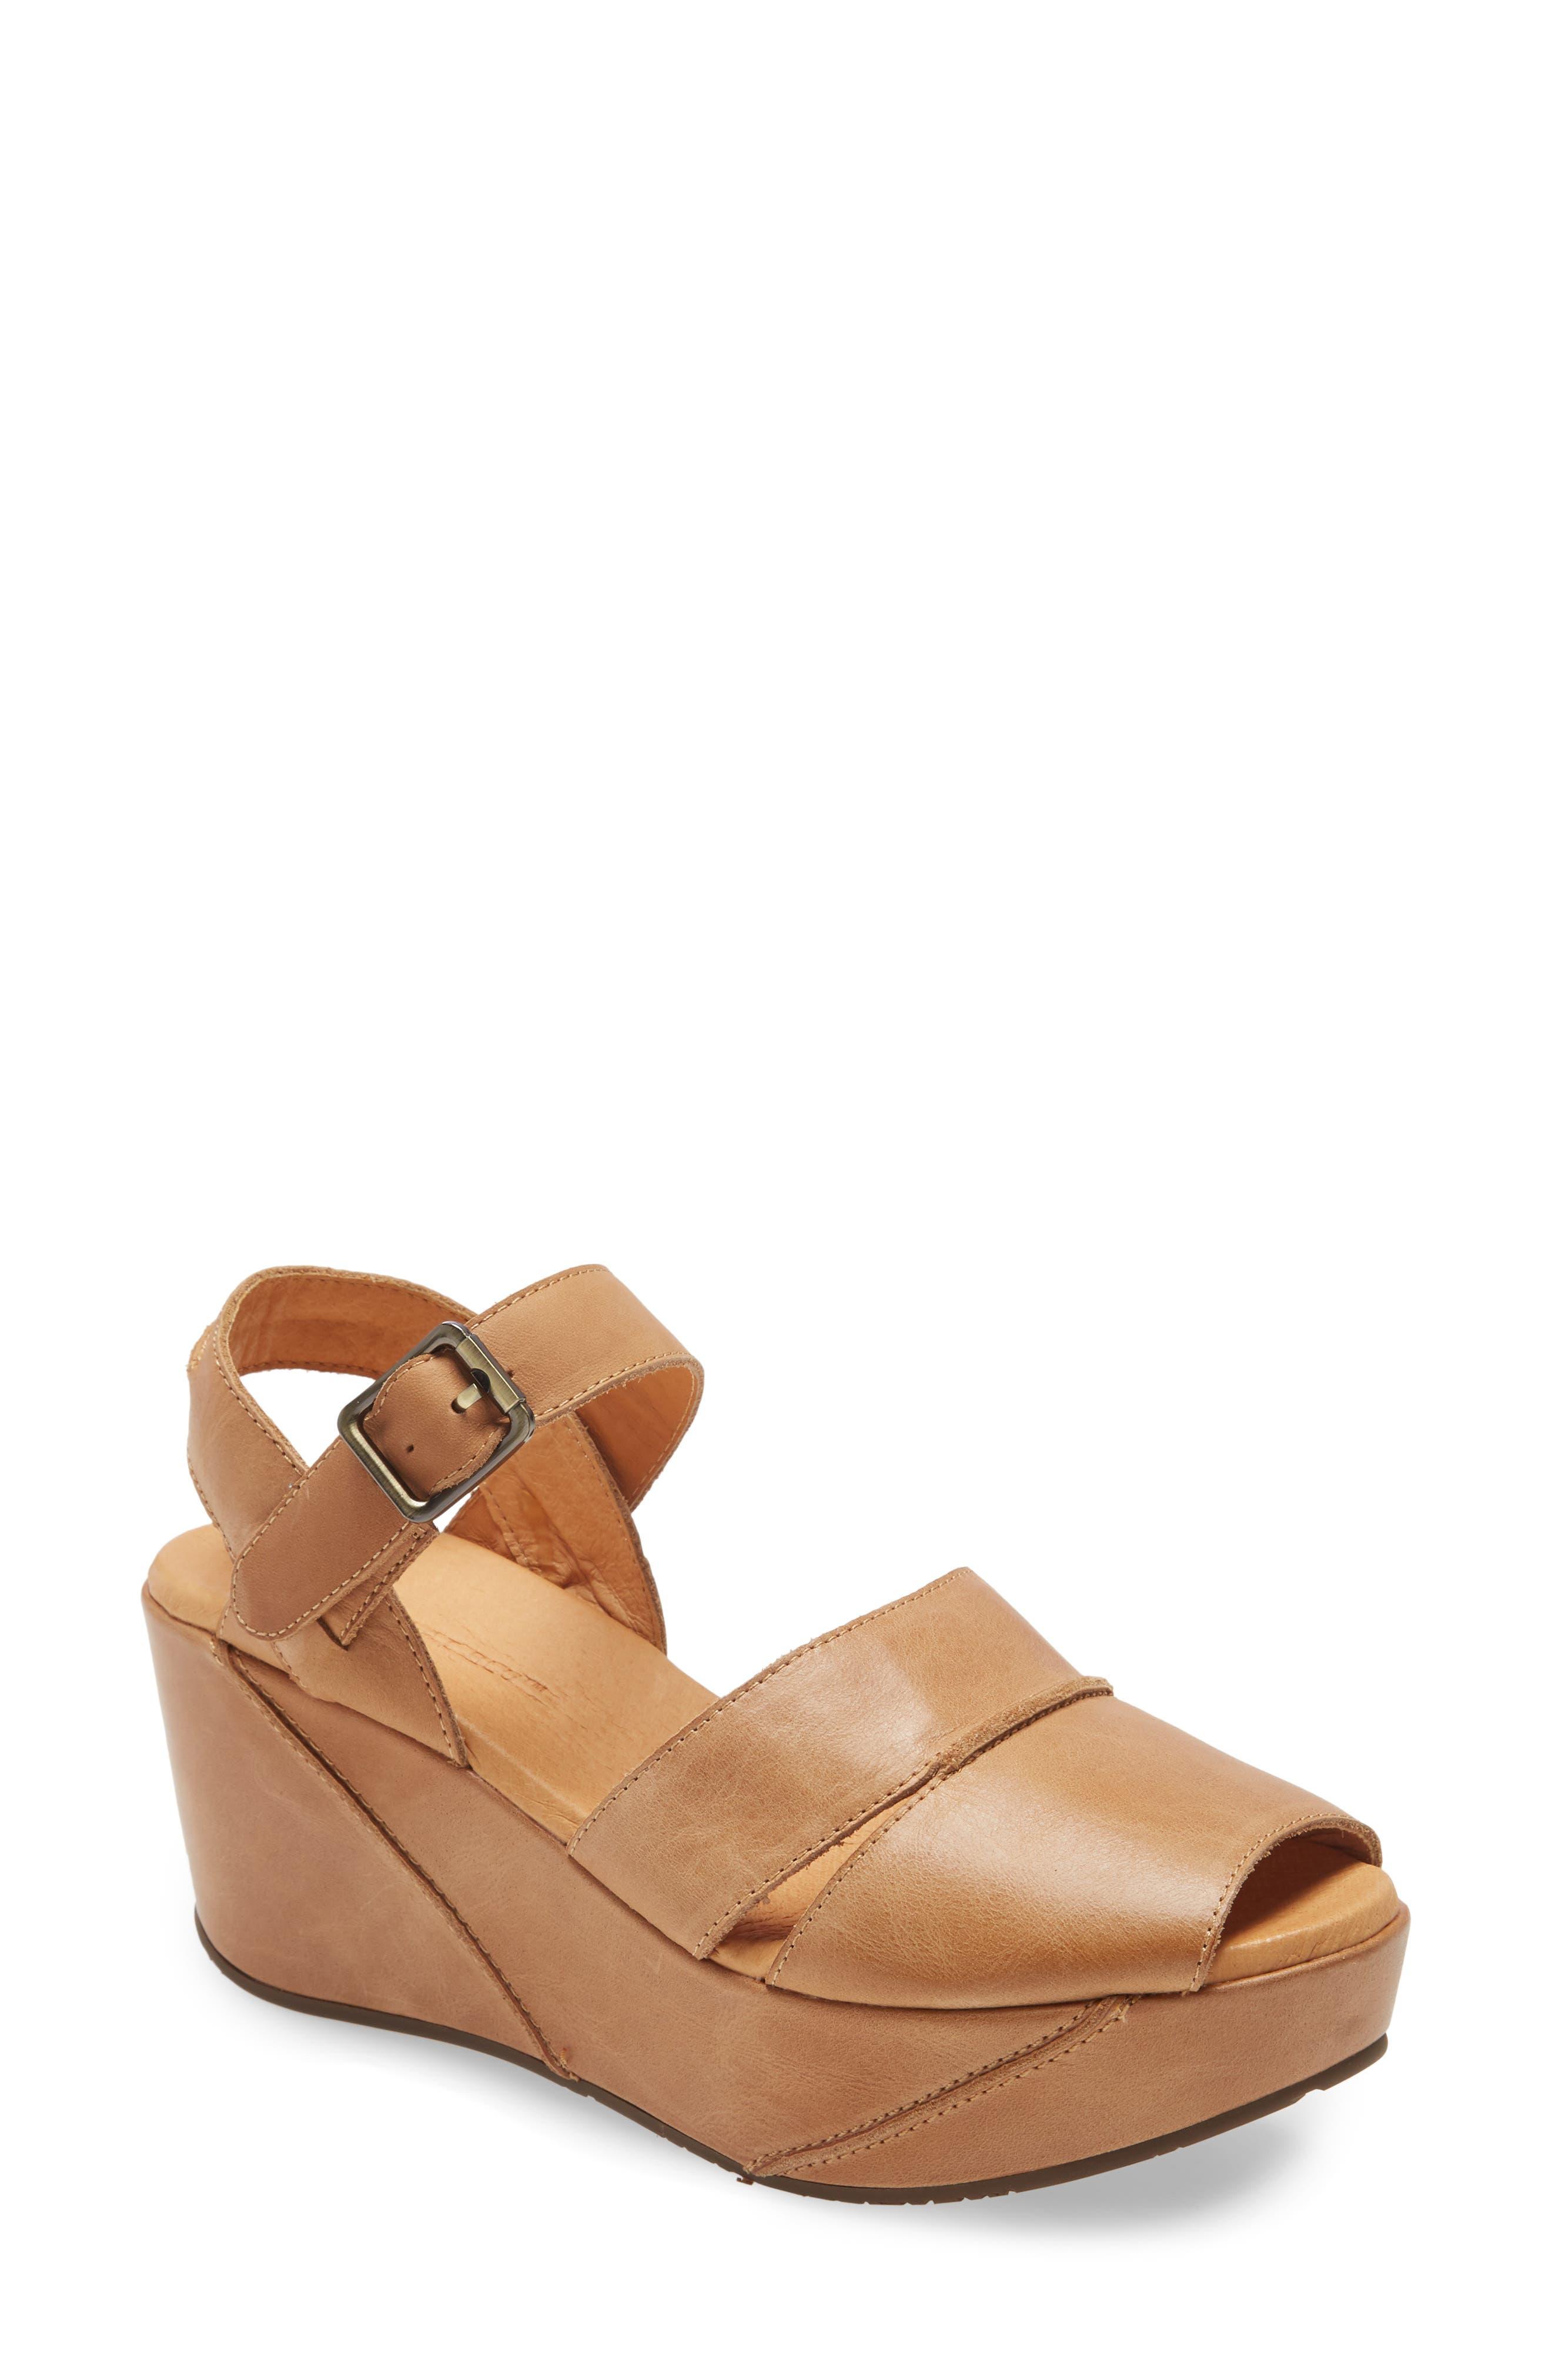 Women's Chocolate Blu Yaz Leather Wedge Sandal